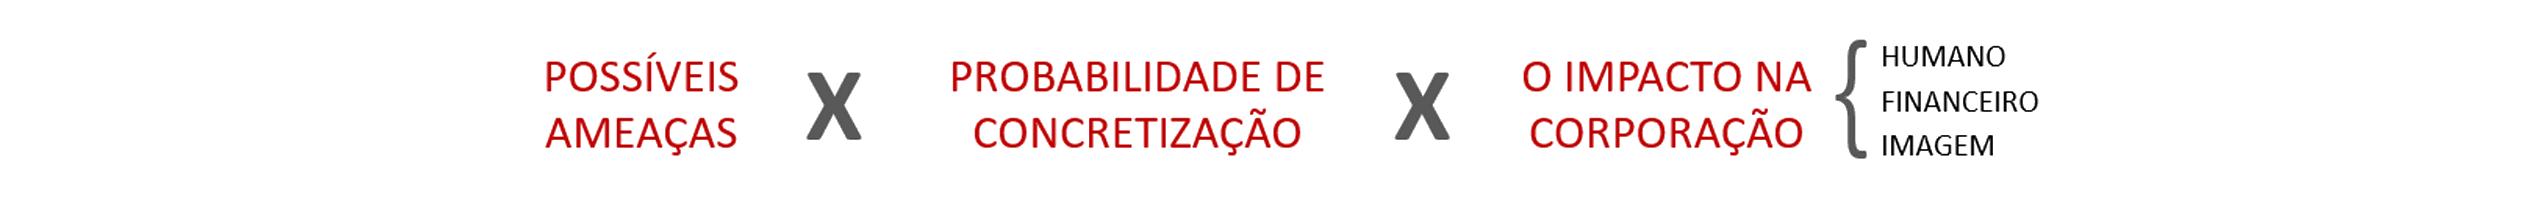 GRUPO-VIKINGS-ODIN-SEGURANÇA-BANNER-RISCOS